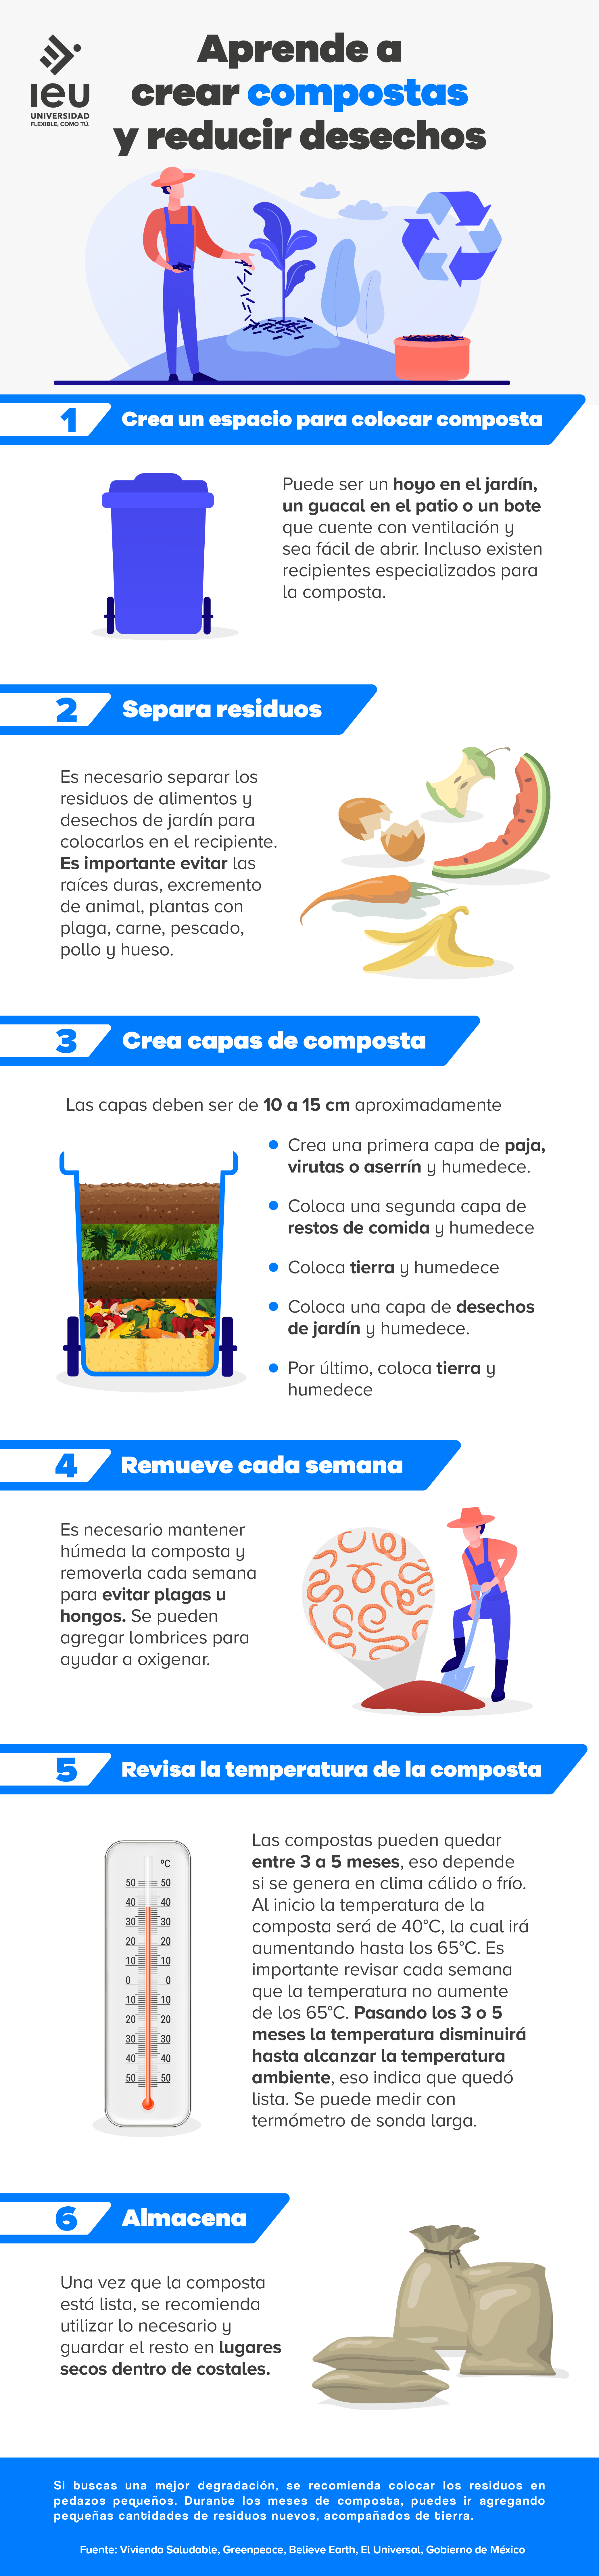 aprende a crear compostas y reducir desechos infografia